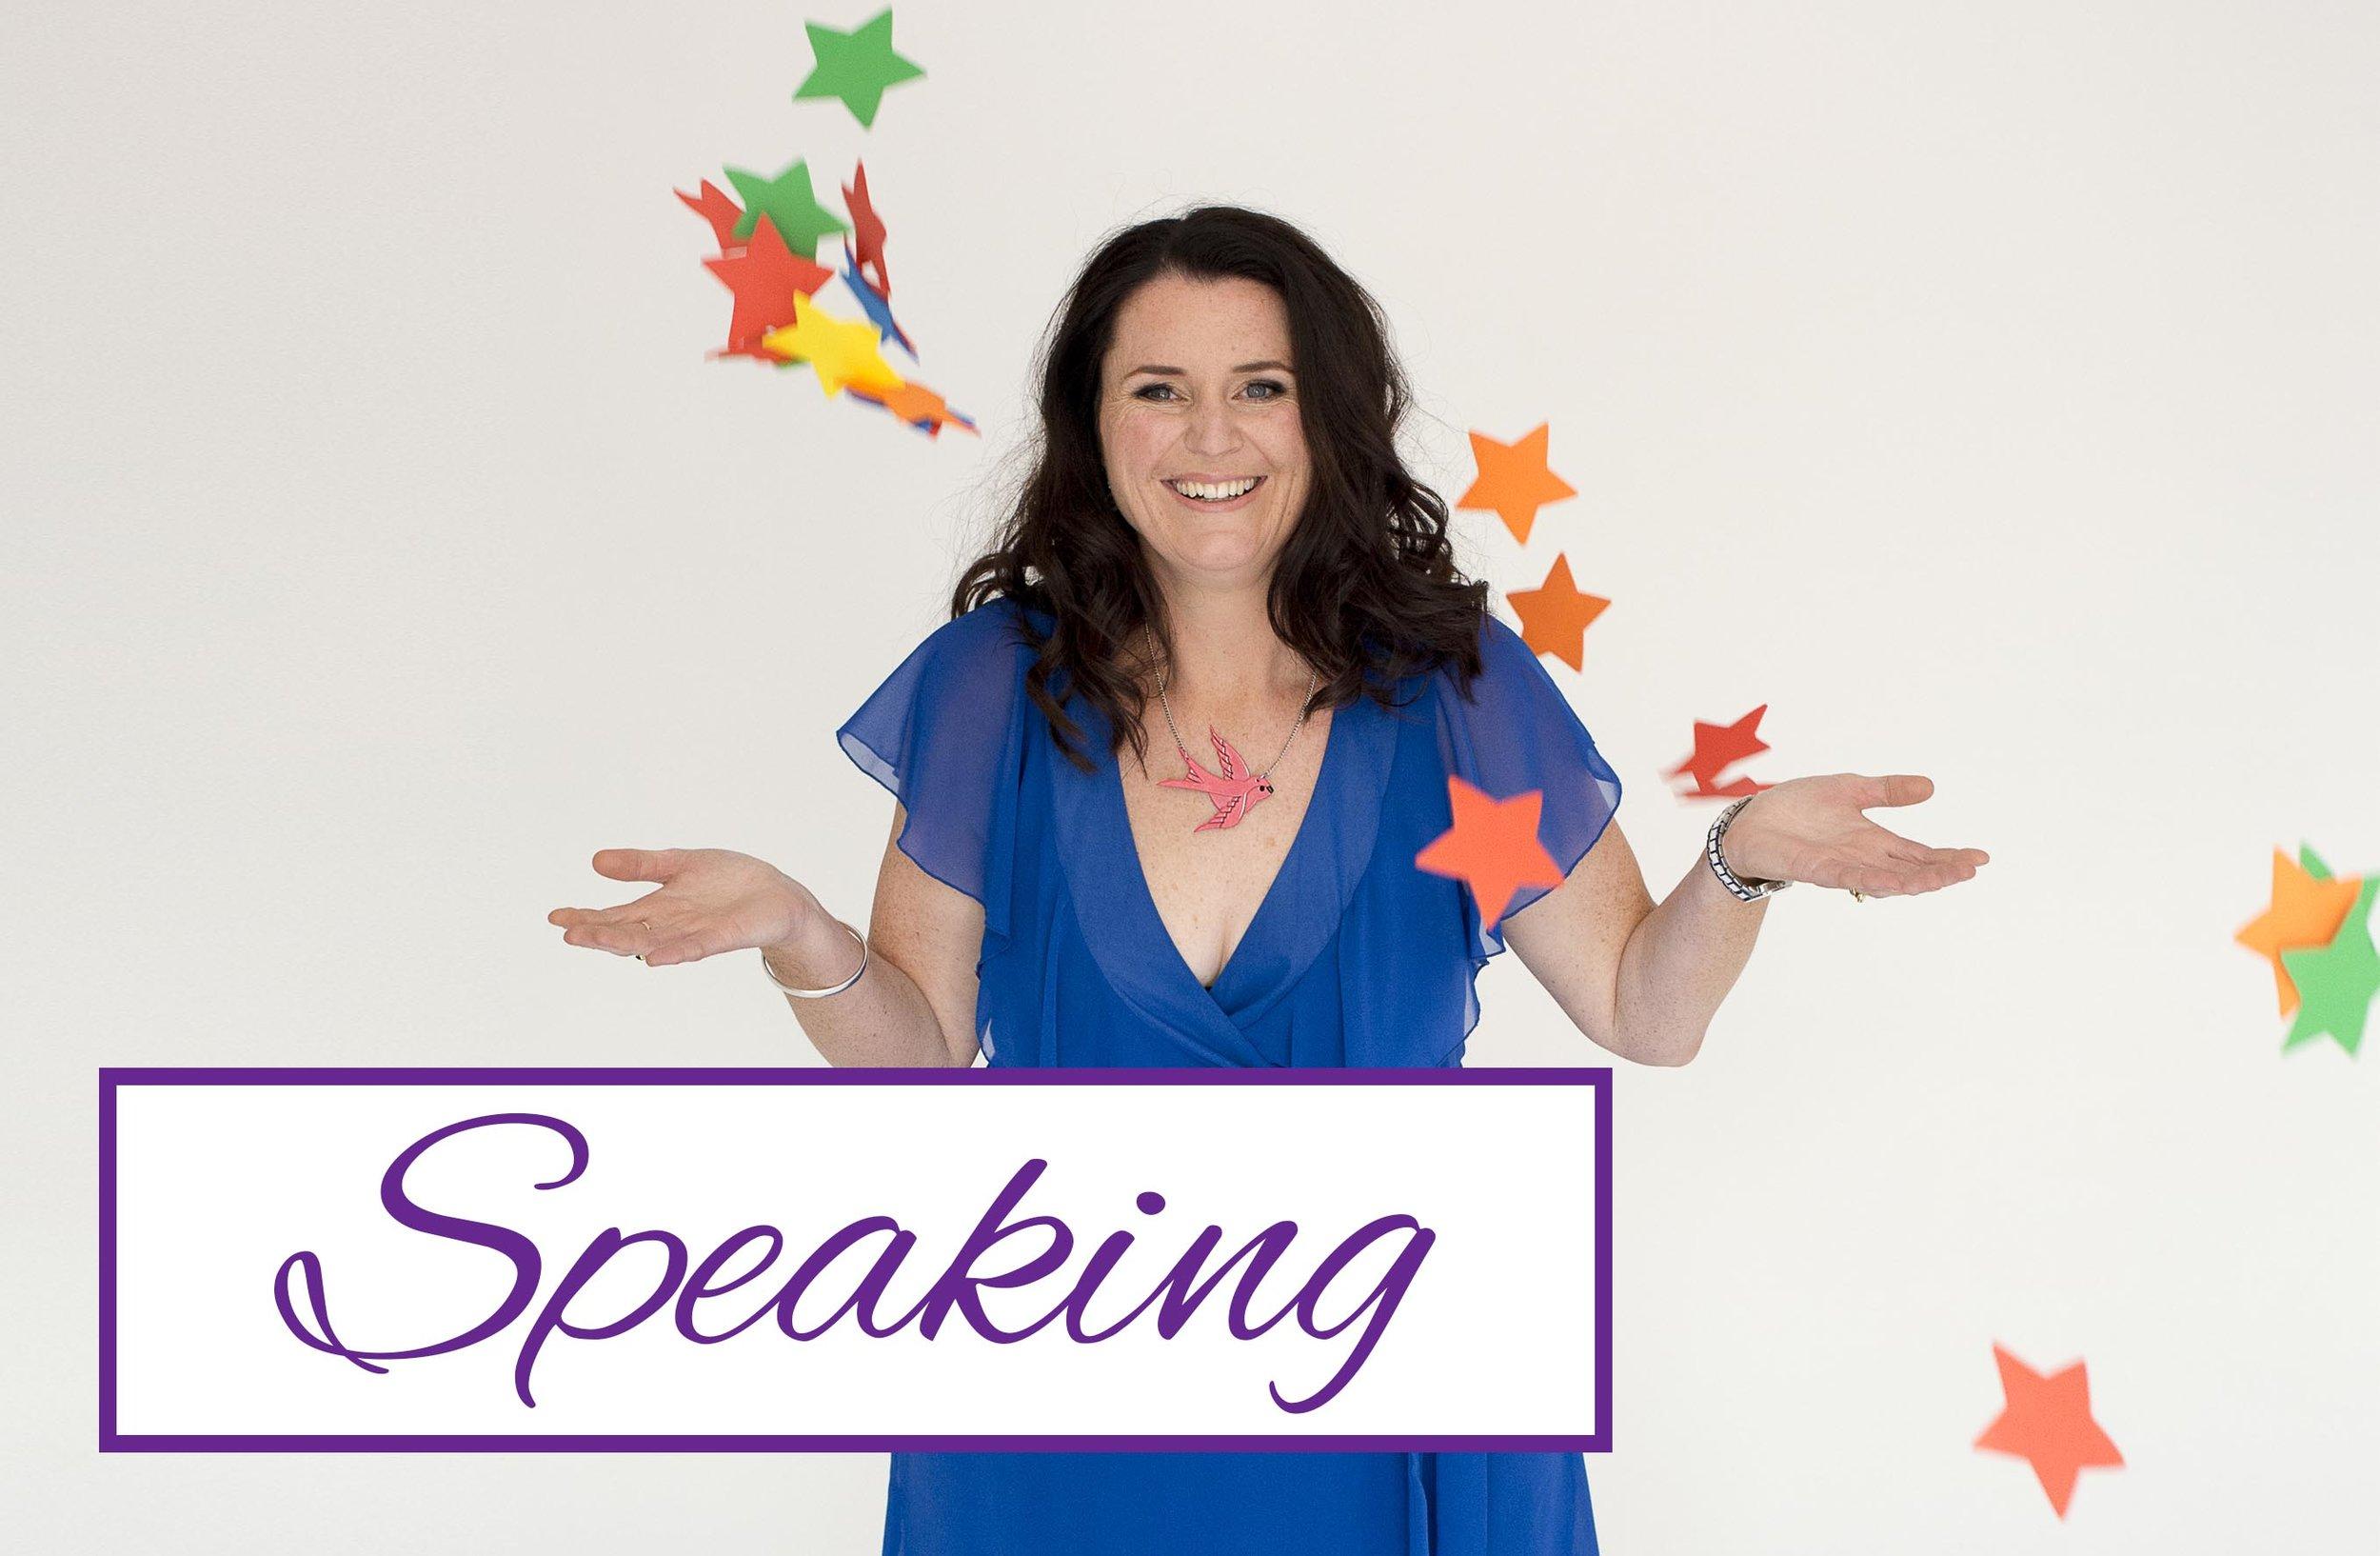 Speaking-Thumbnail.jpg